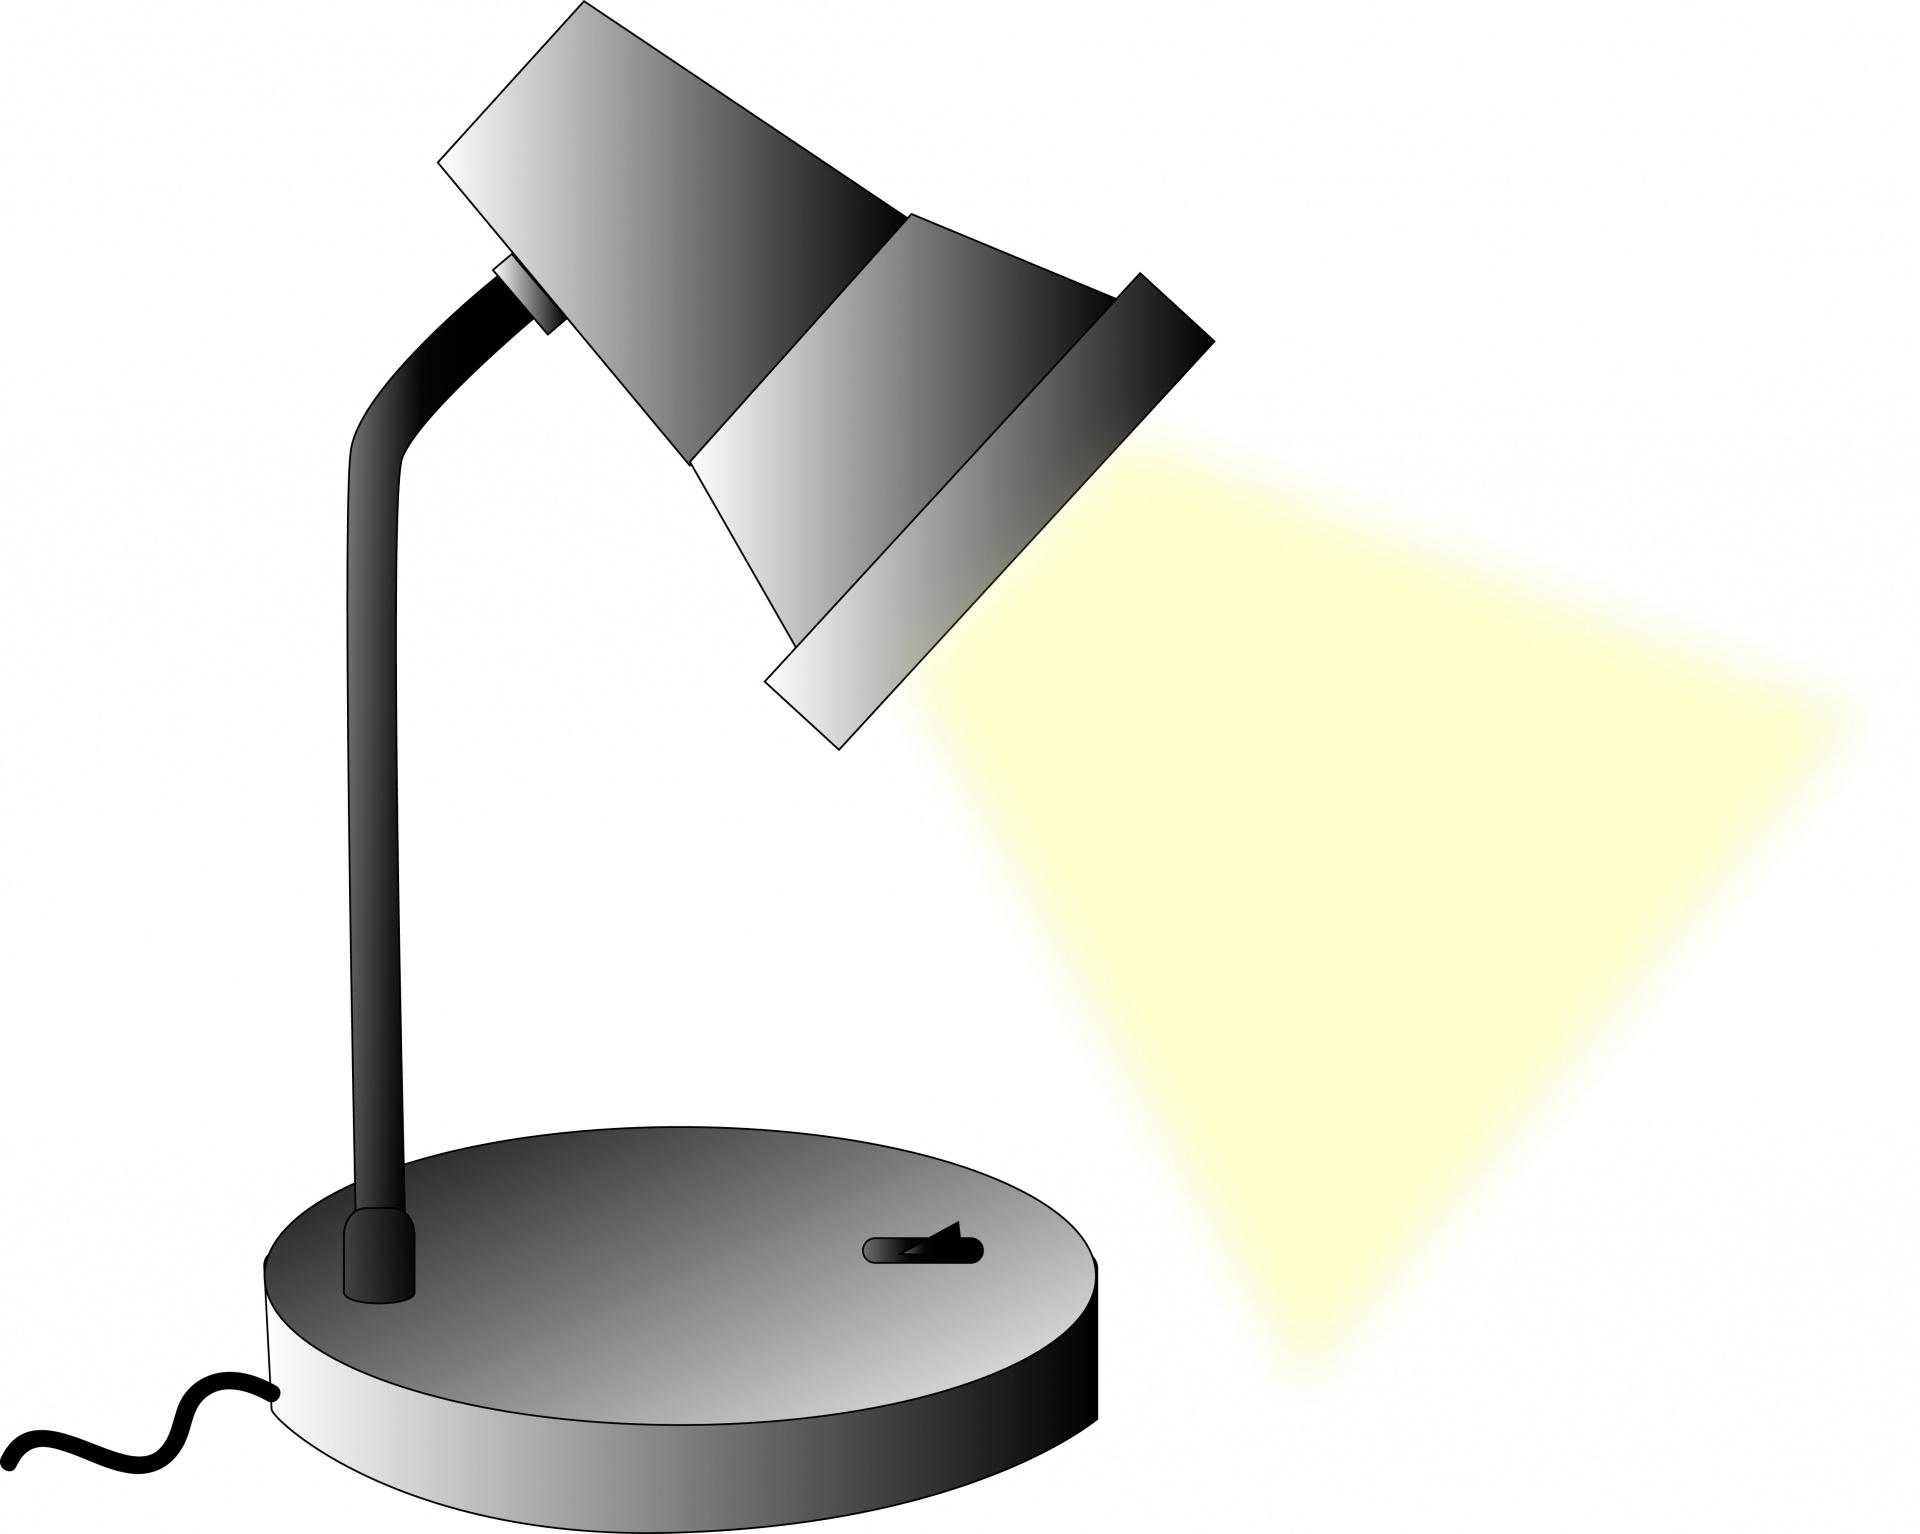 Desktop Lamp Free Stock Photo